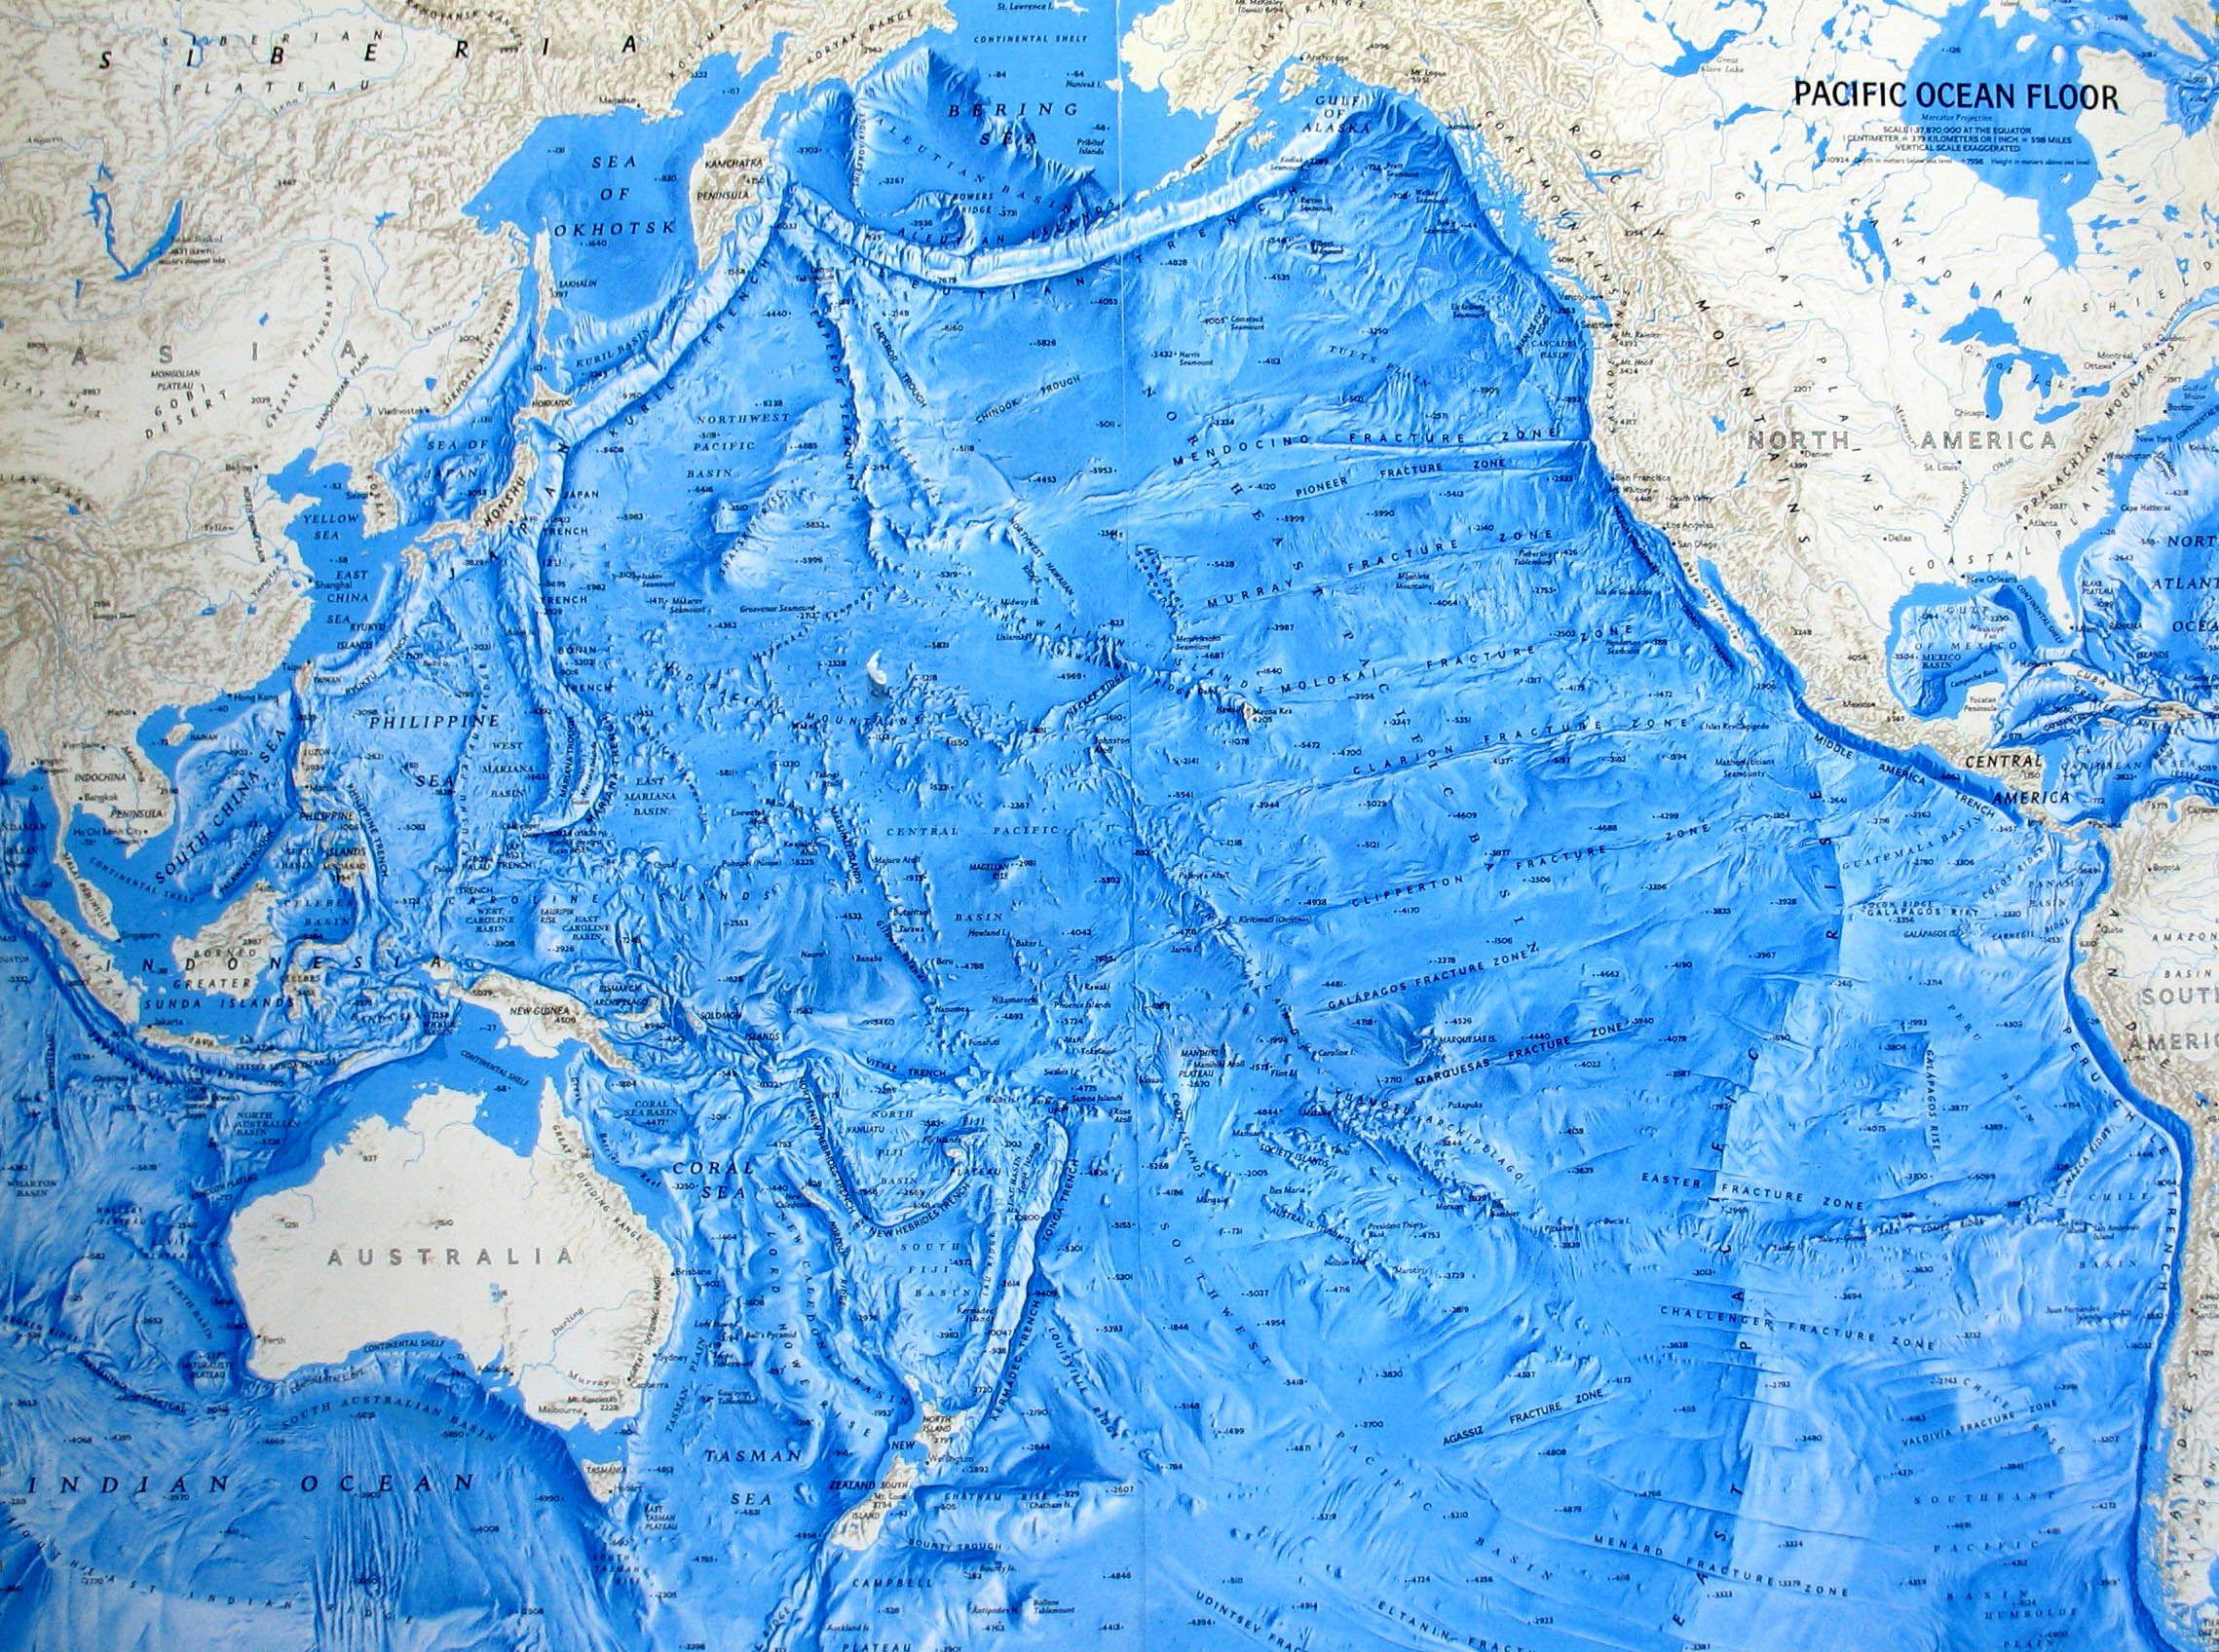 pacific ocean depth map Ocean Floor Relief Maps Detailed Maps Of Sea And Ocean Depths pacific ocean depth map